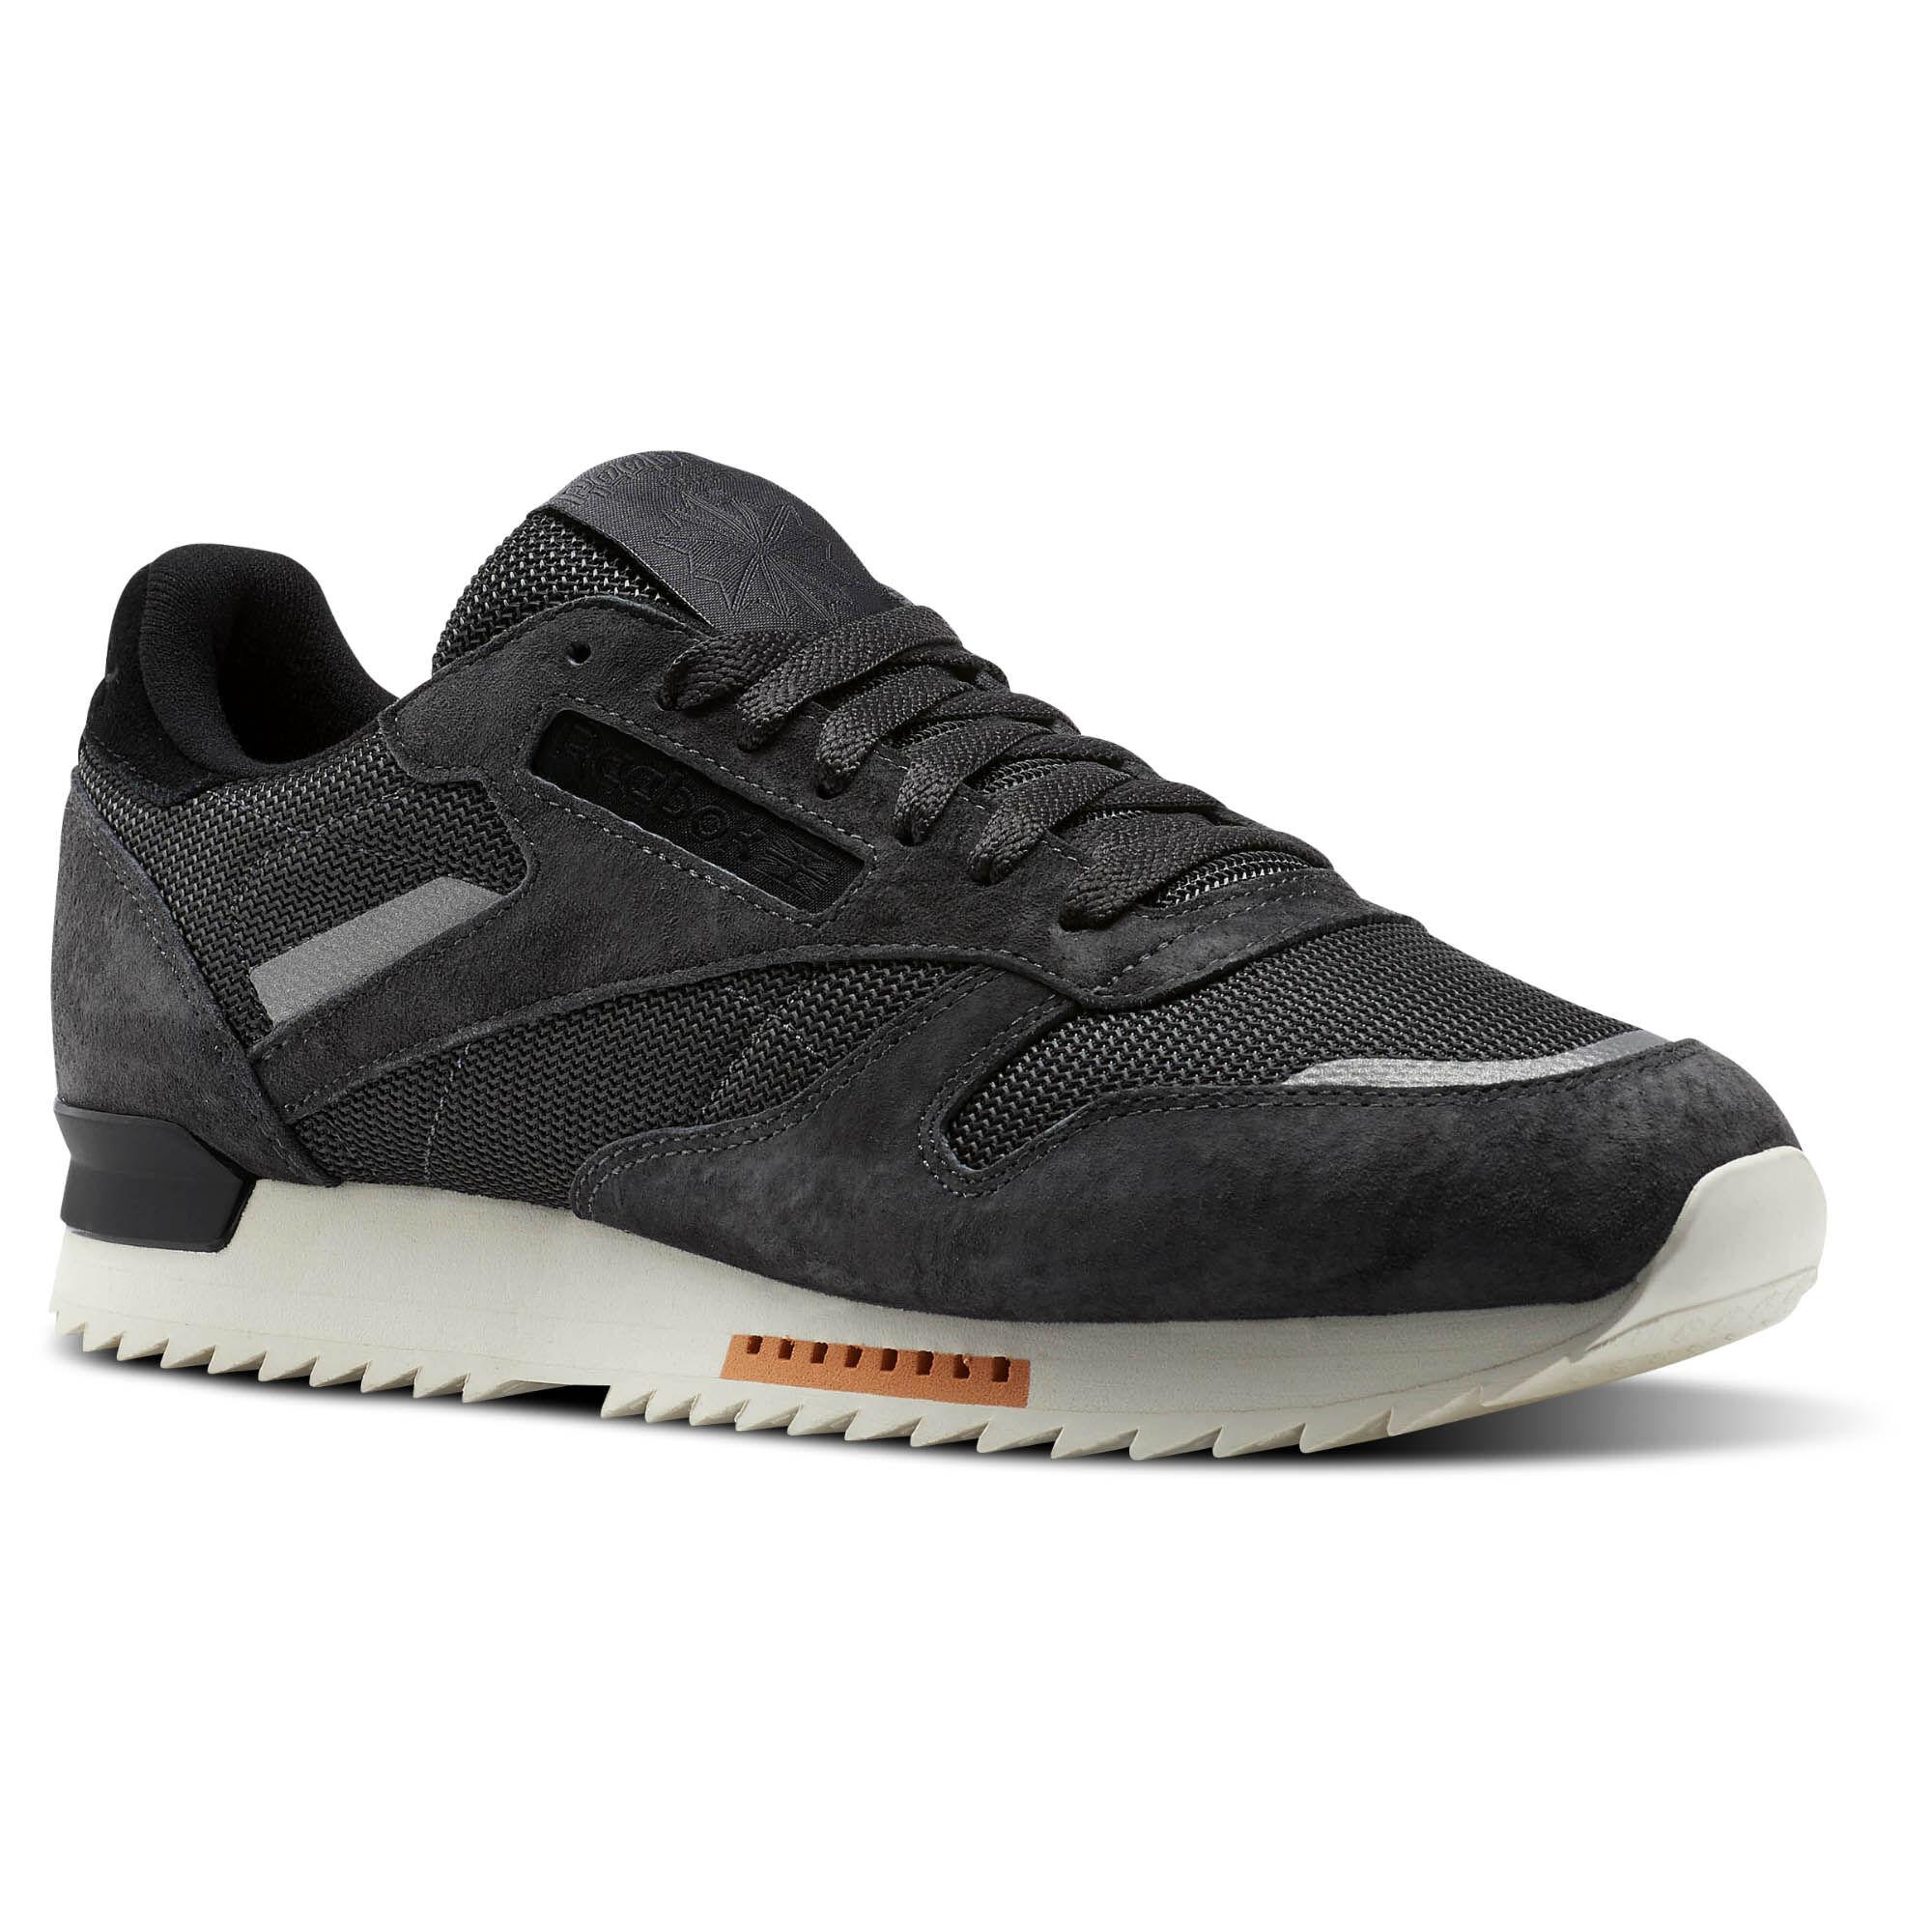 Mens Classic Leather Ripple Sm Trainers, Black Reebok